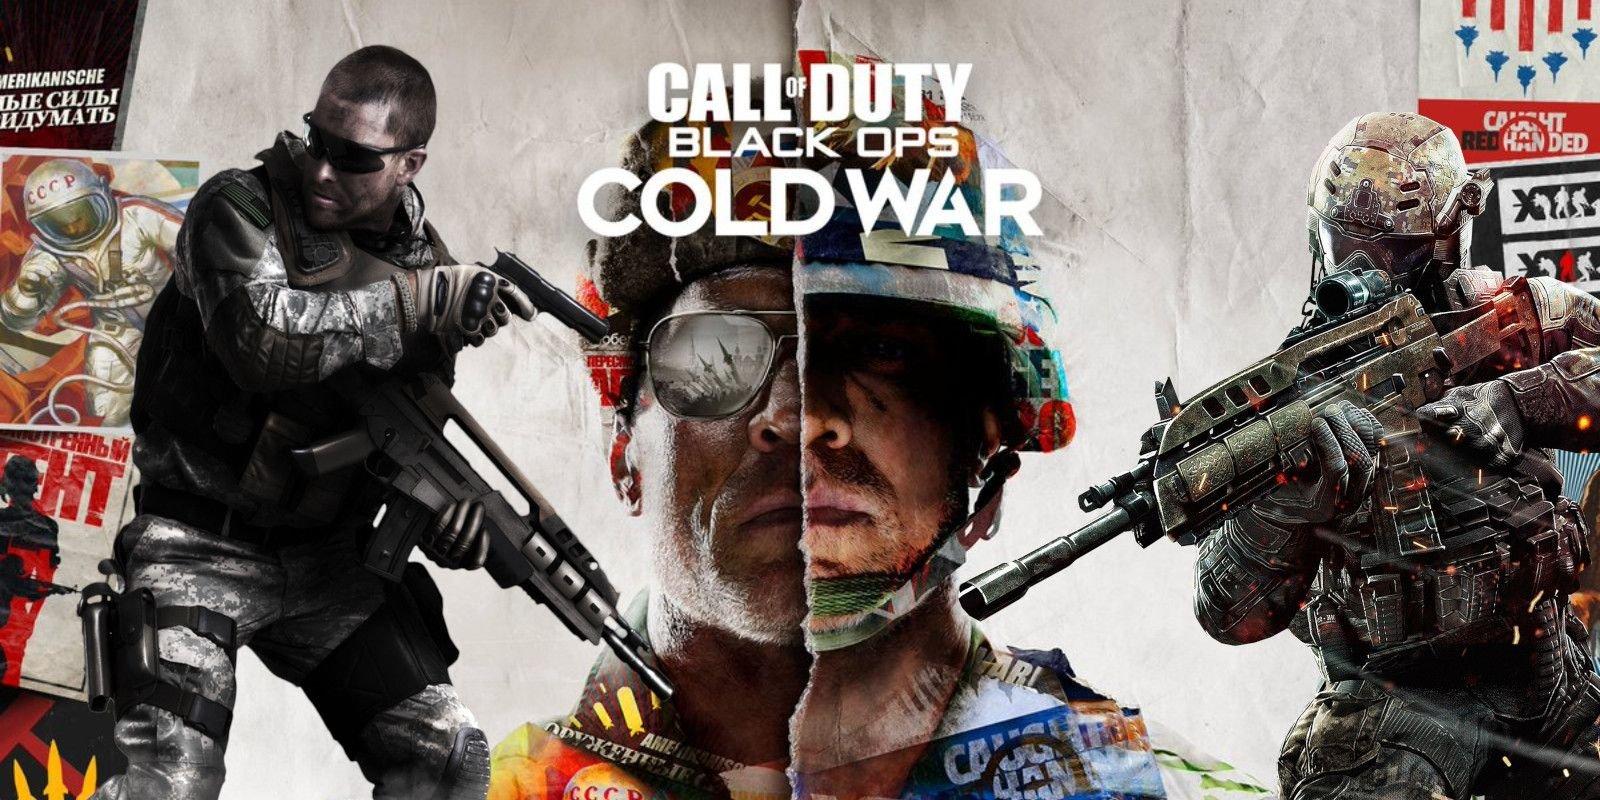 Call of Duty Black Ops: Cold War Multiplayer Fragmanı